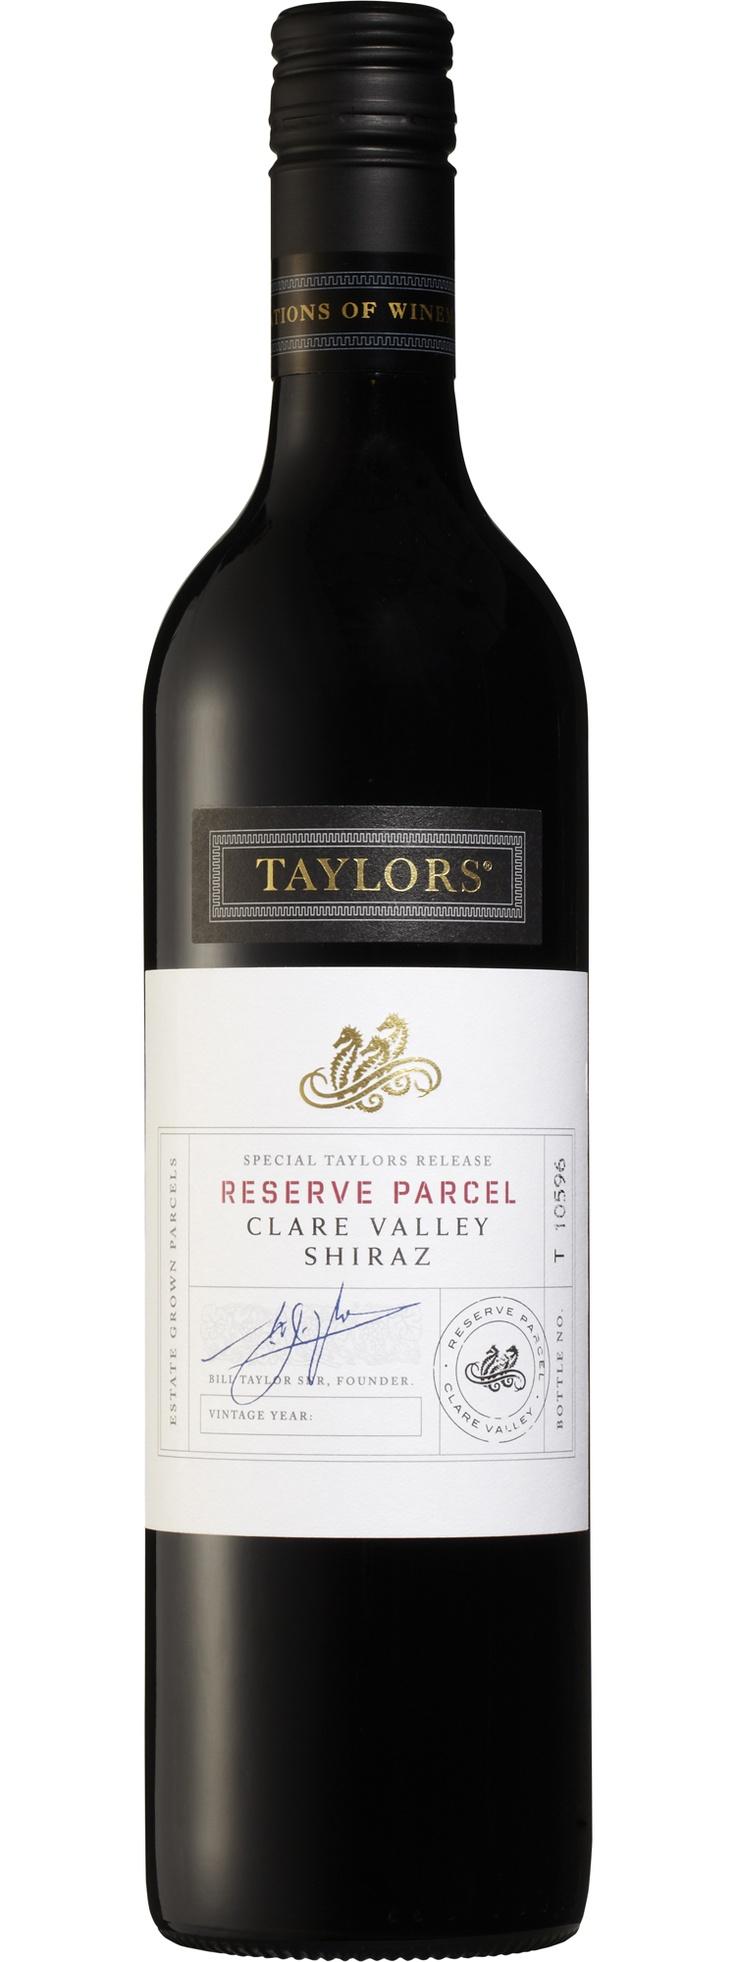 Taylors Reserve Parcel Shiraz | Dan Murphy's | Buy Wine, Champagne, Beer & Spirits Online